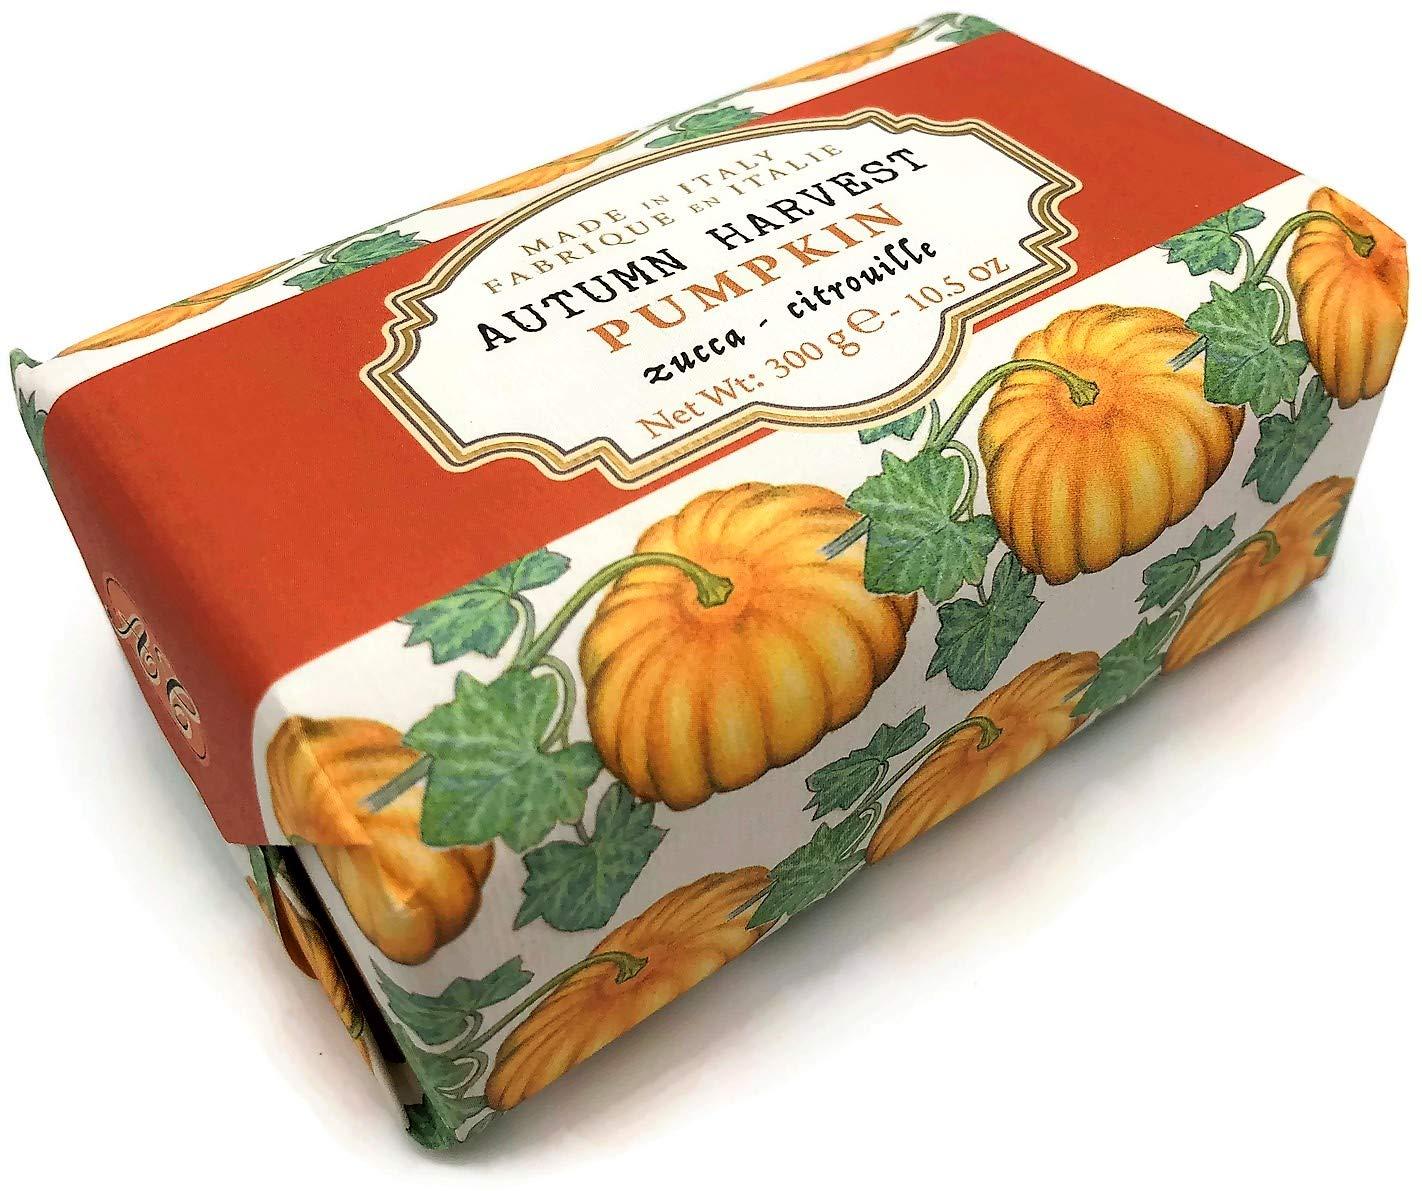 Amazon.com : Alighiero Campostrini Autumn Harvest Pumpkin Italian Luxury Bath Soap 10.5 ounces : Beauty